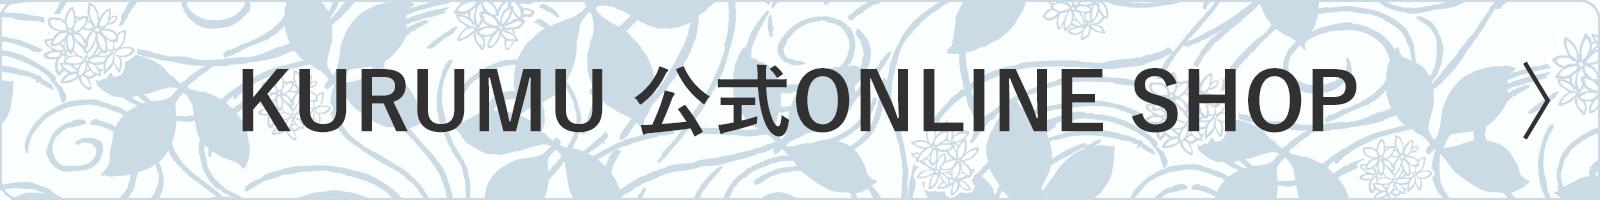 KURUMU 公式ONLINE SHOP